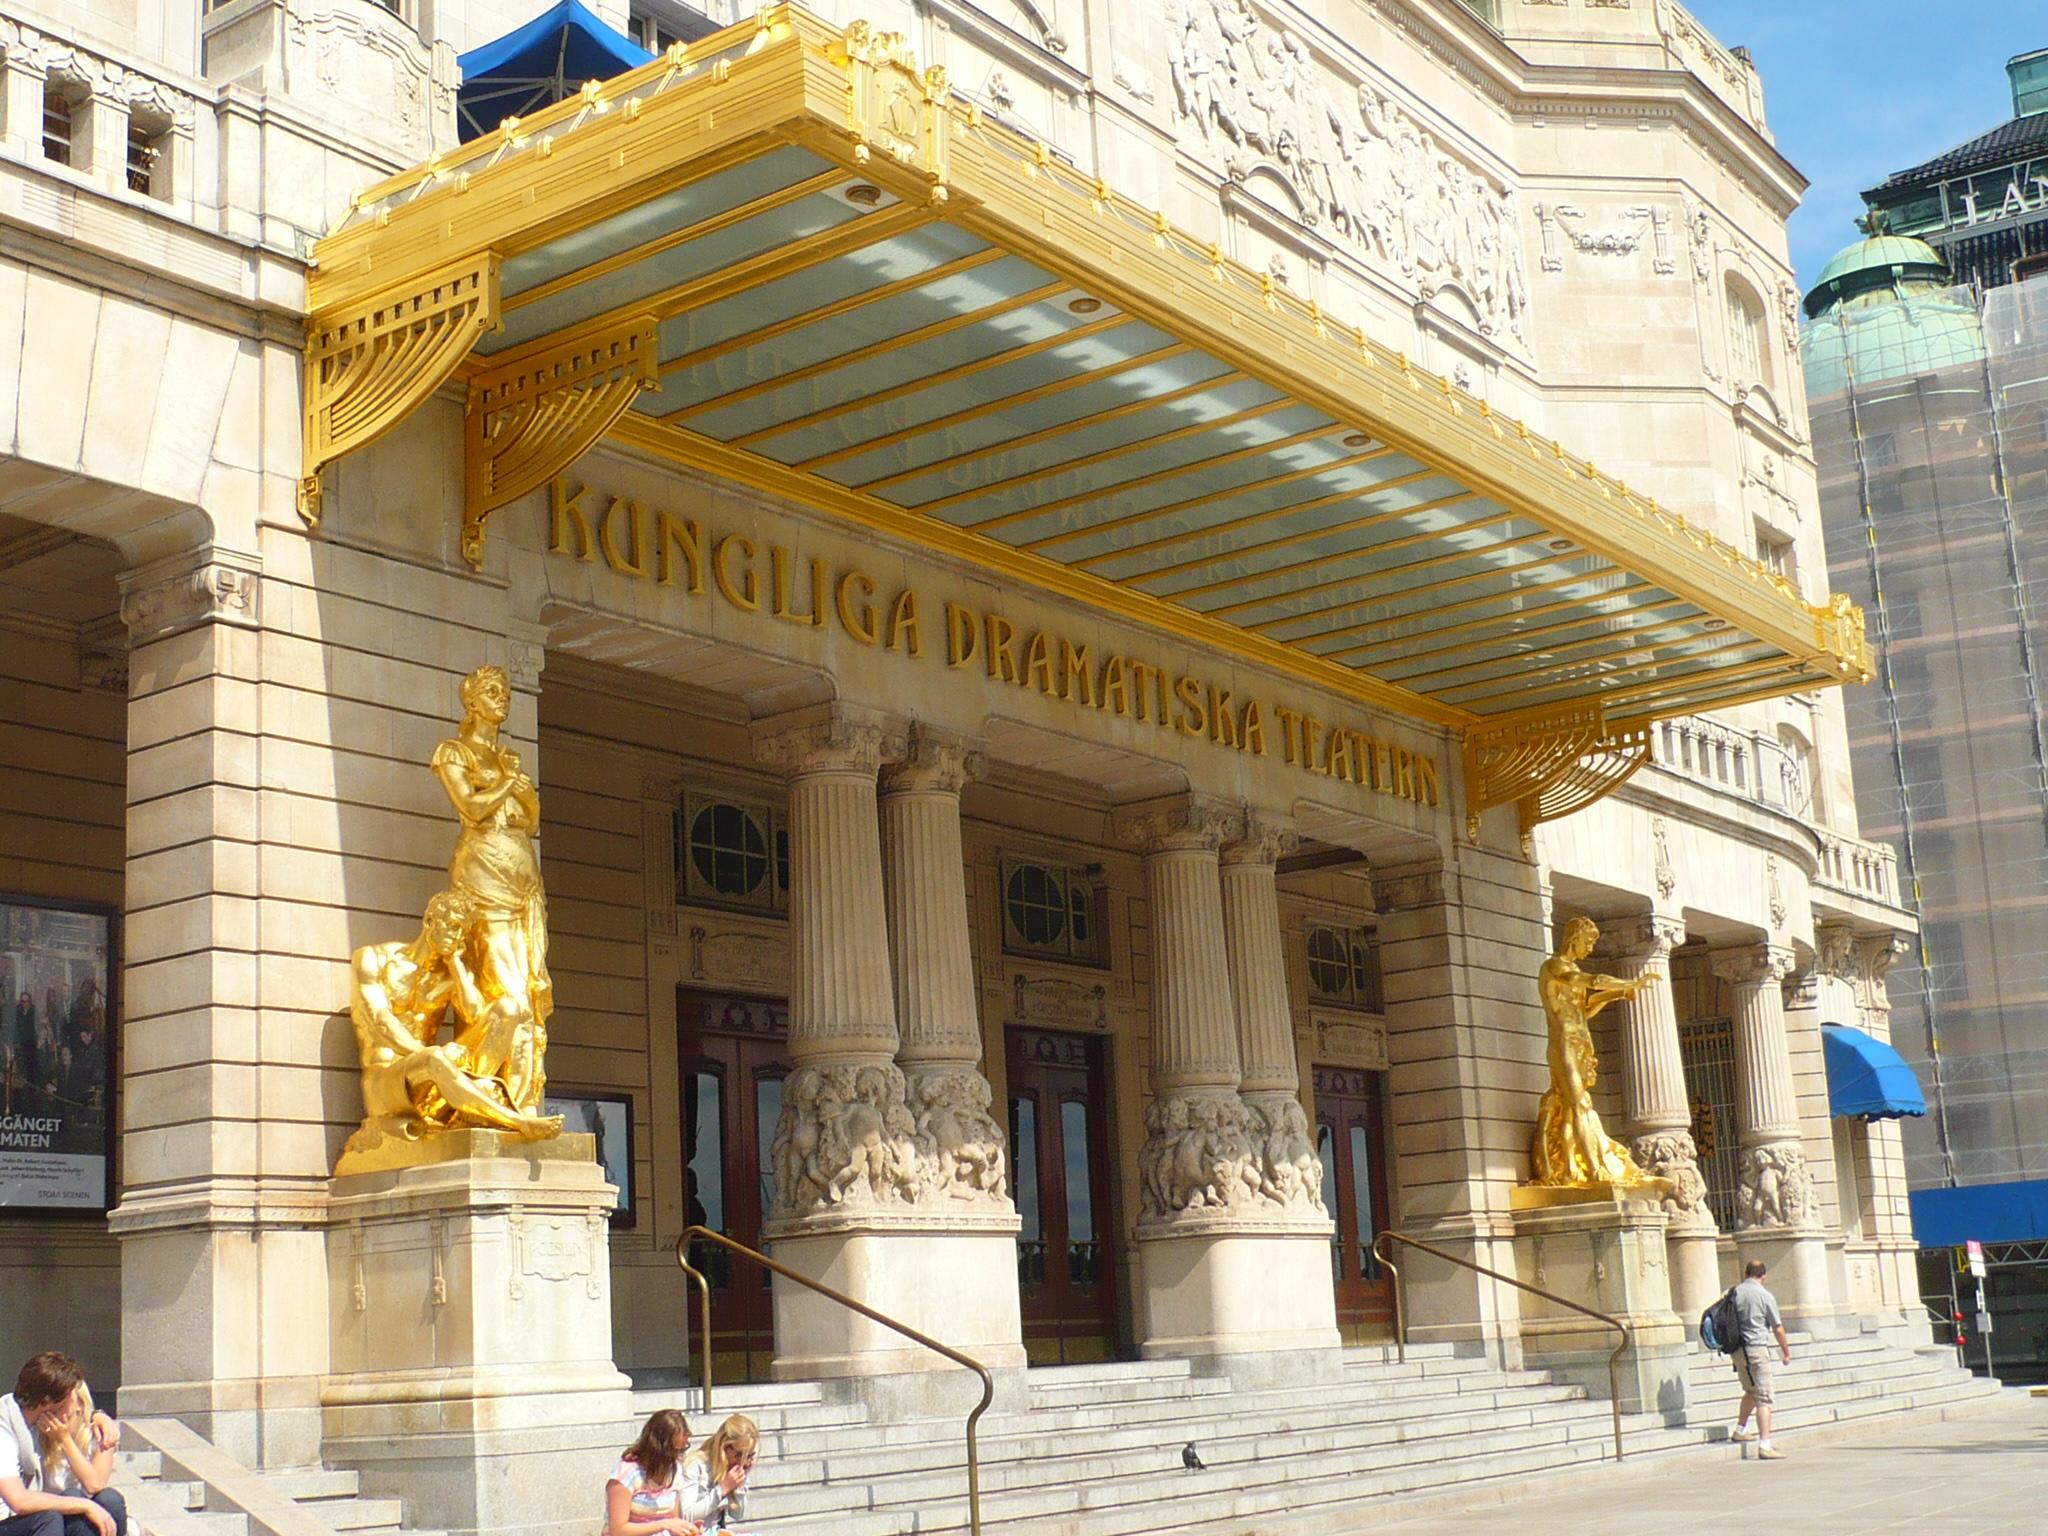 Royal Theatre - Stockholm